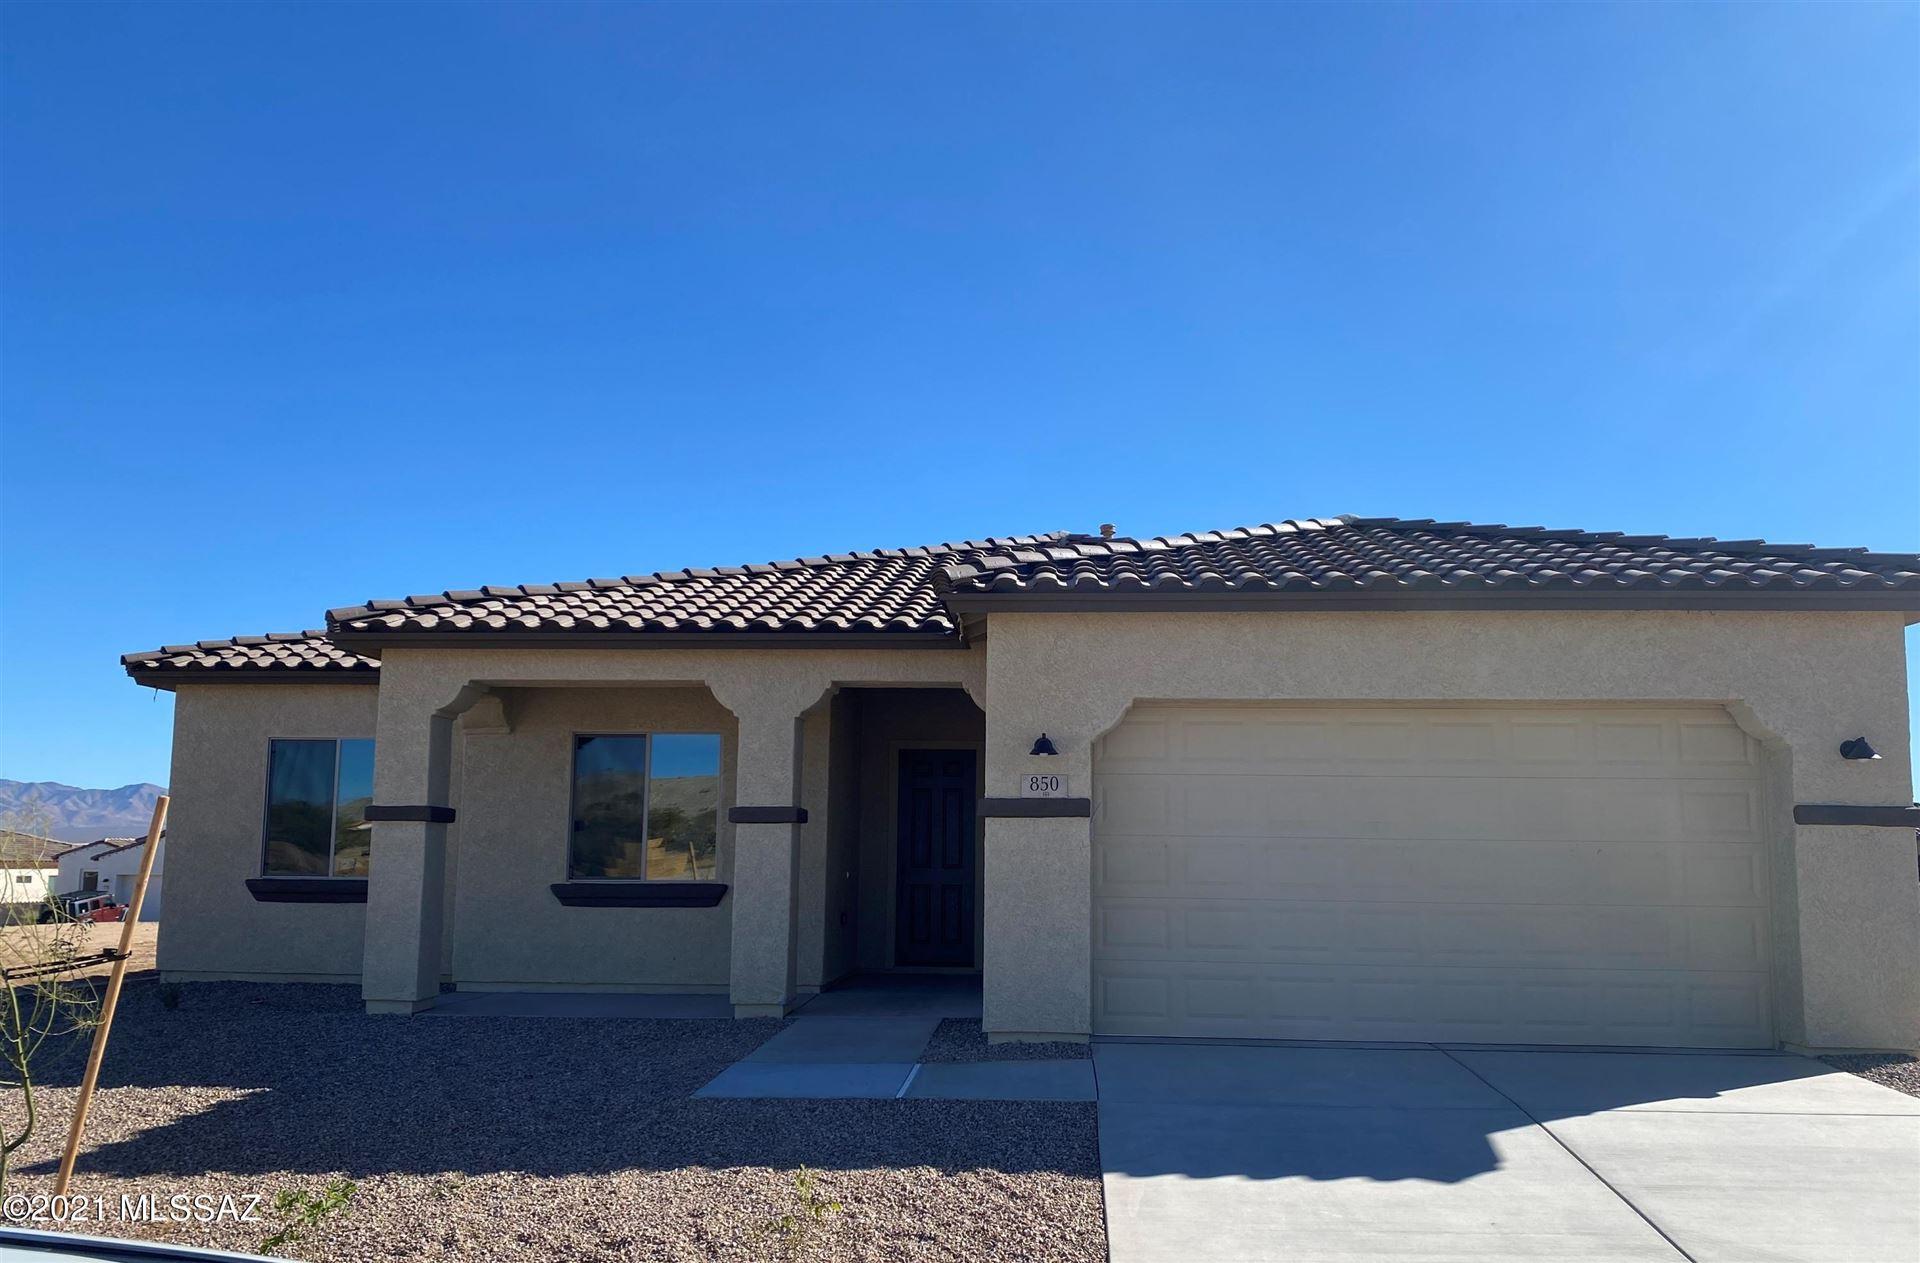 850 N Magellan Scope Trail #Lot 128, Green Valley, AZ 85614 - #: 22002486